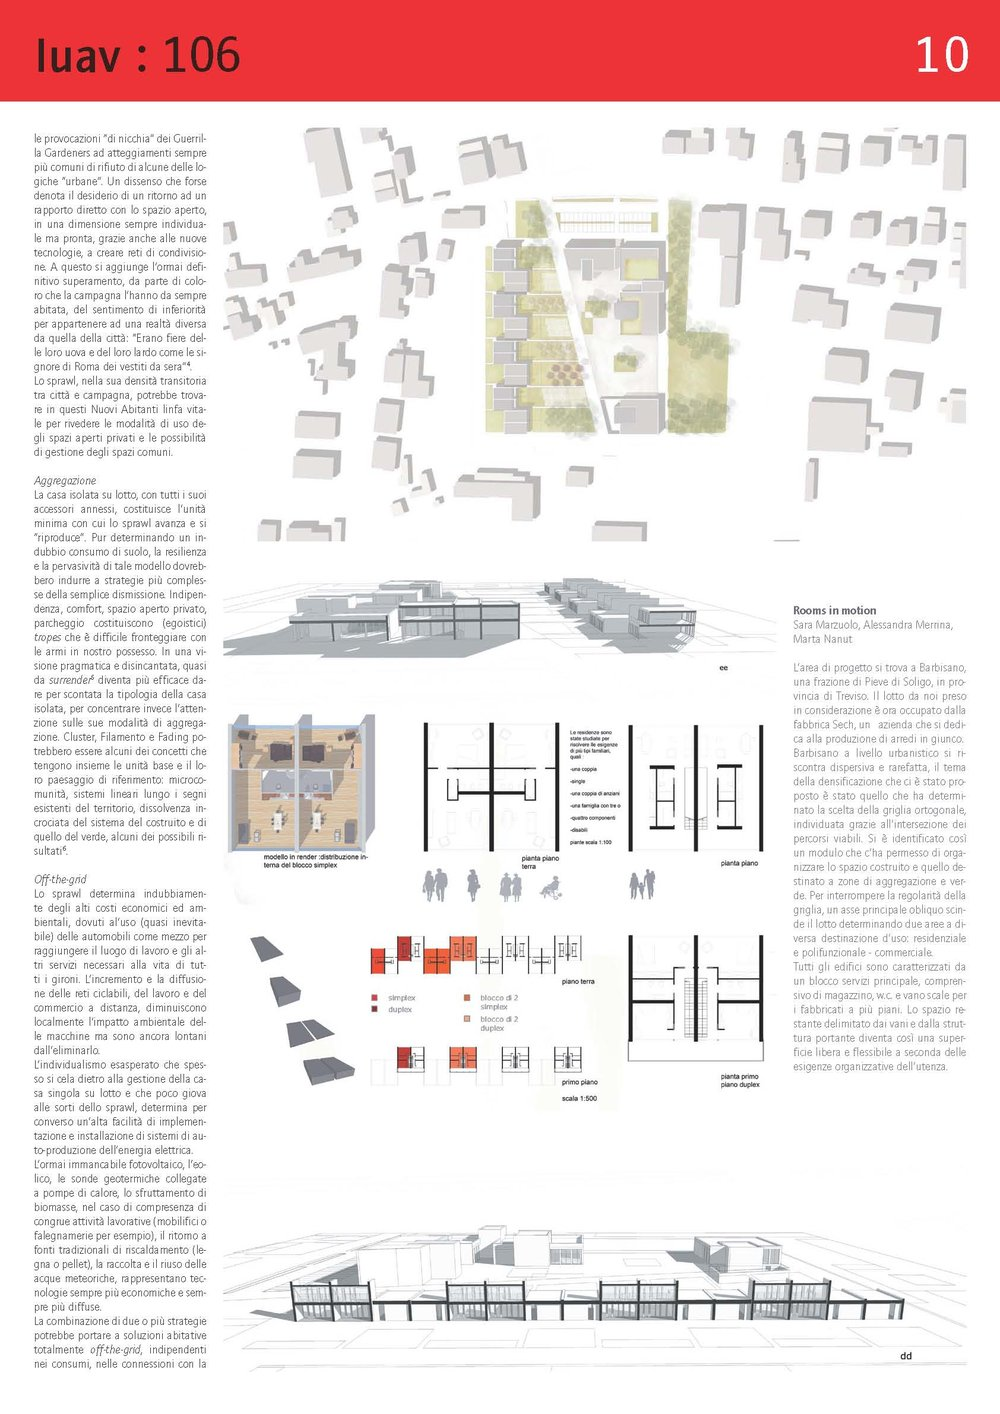 Copertine_Pagina_11.jpg